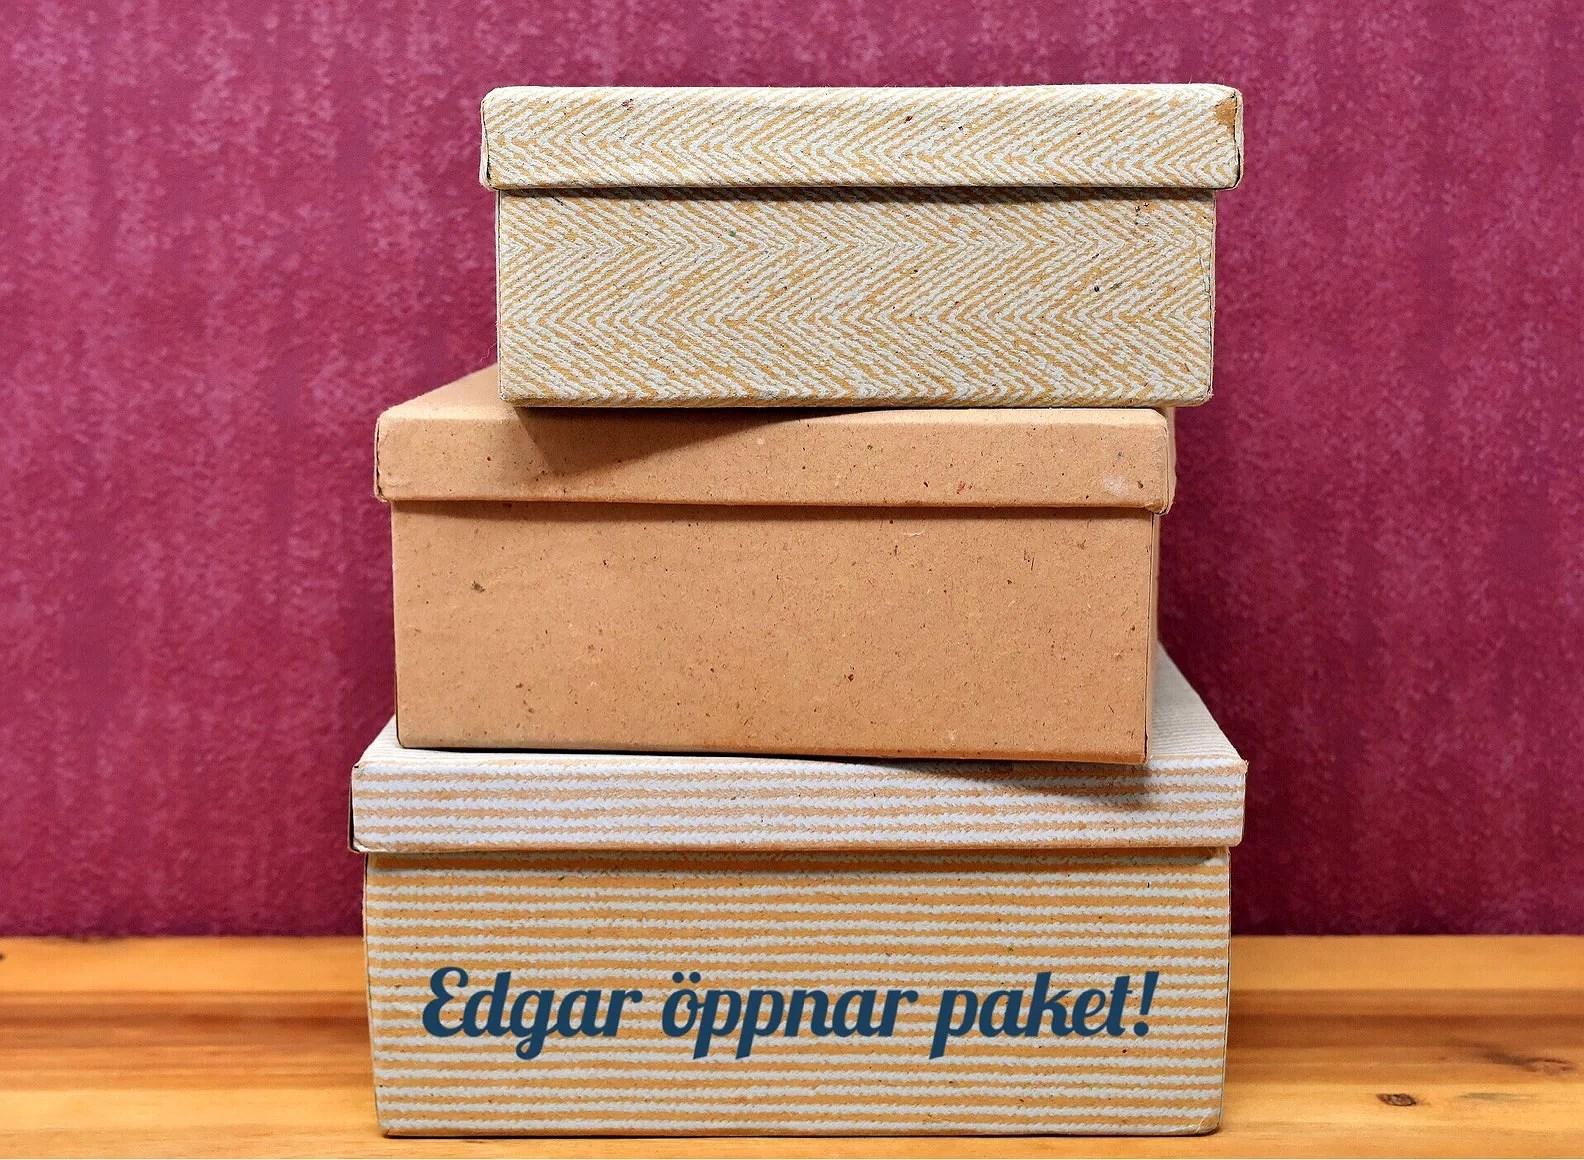 Edgar öppnar paket - Kökets Box!